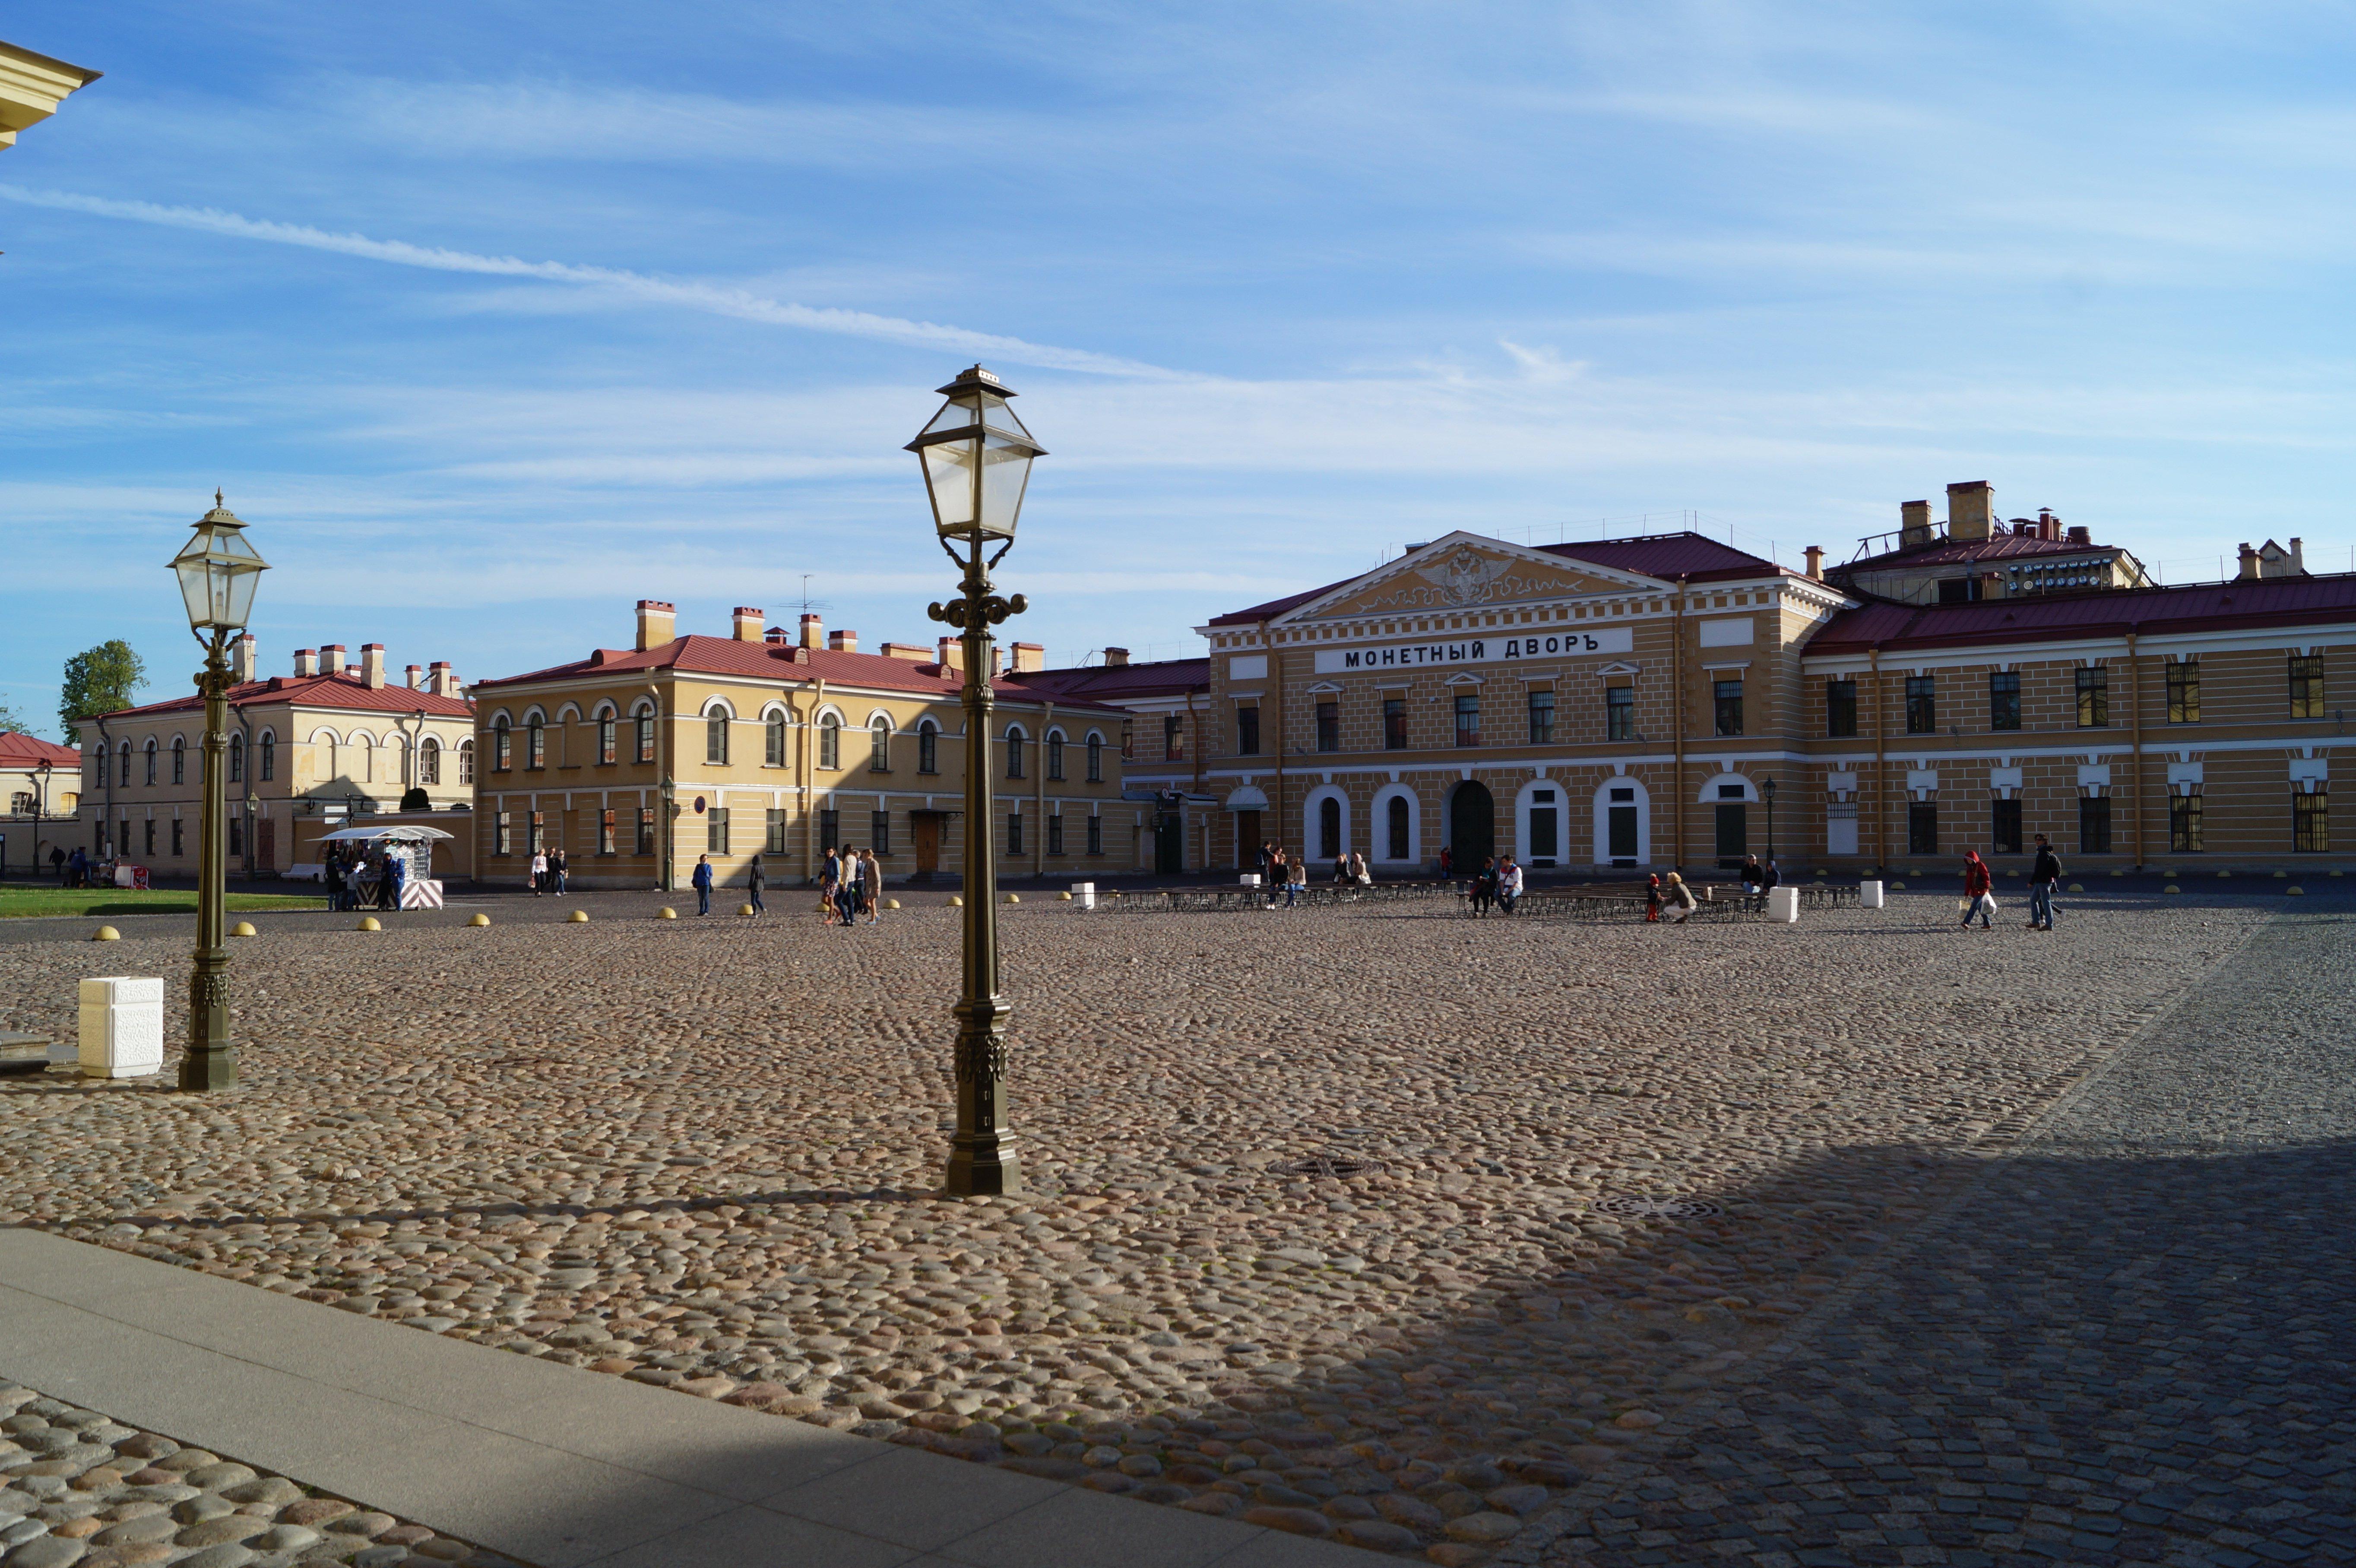 St. Petersburg. Foto: Exbir Travel, C. Maskos